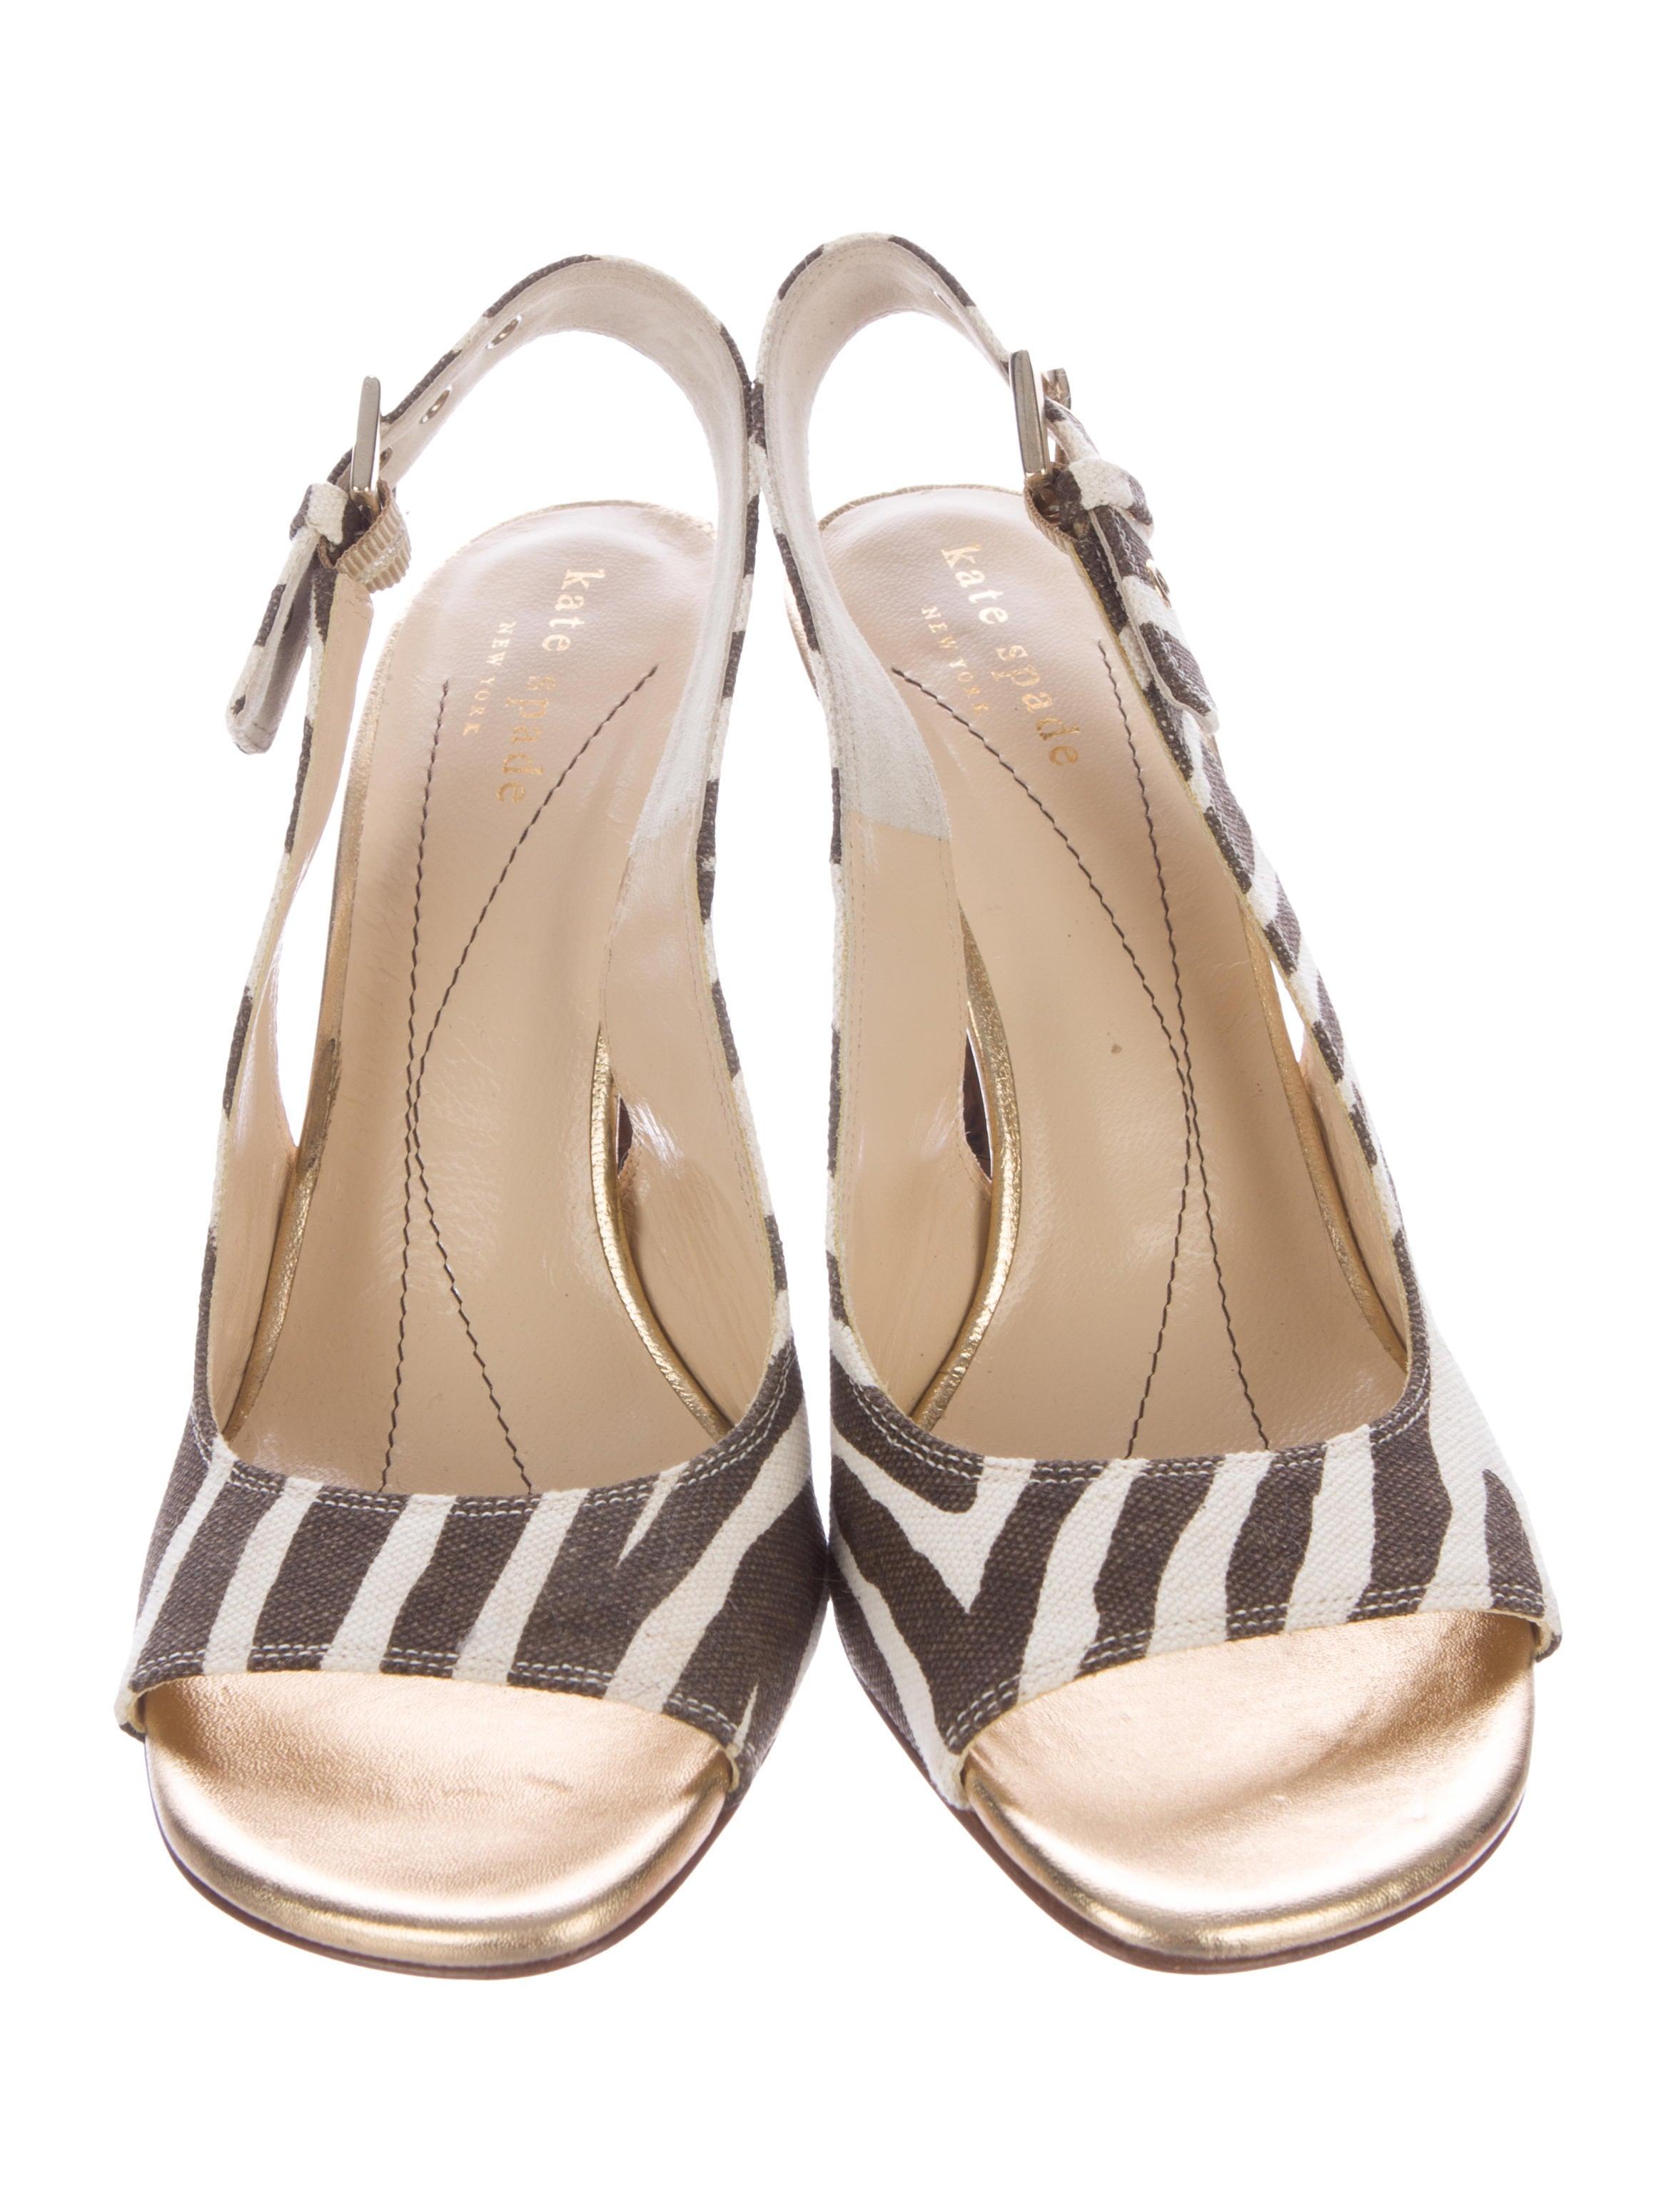 Kate Spade New York Slingback Zebra Sandals Shoes Wka45623 The Realreal